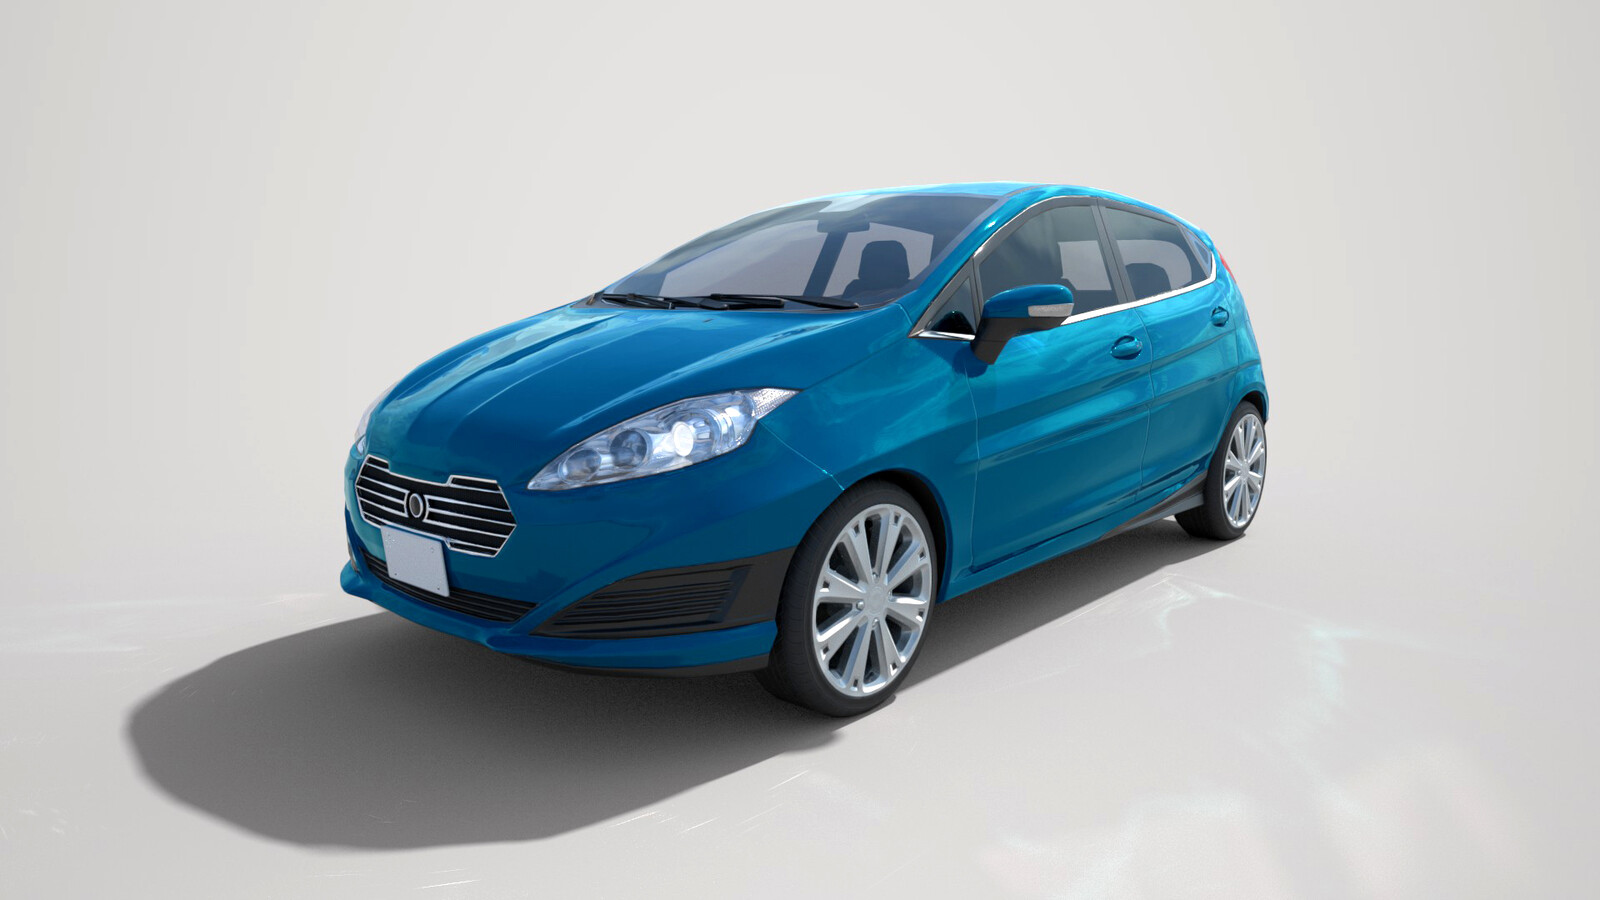 Ford Fiesta (unlicensed)